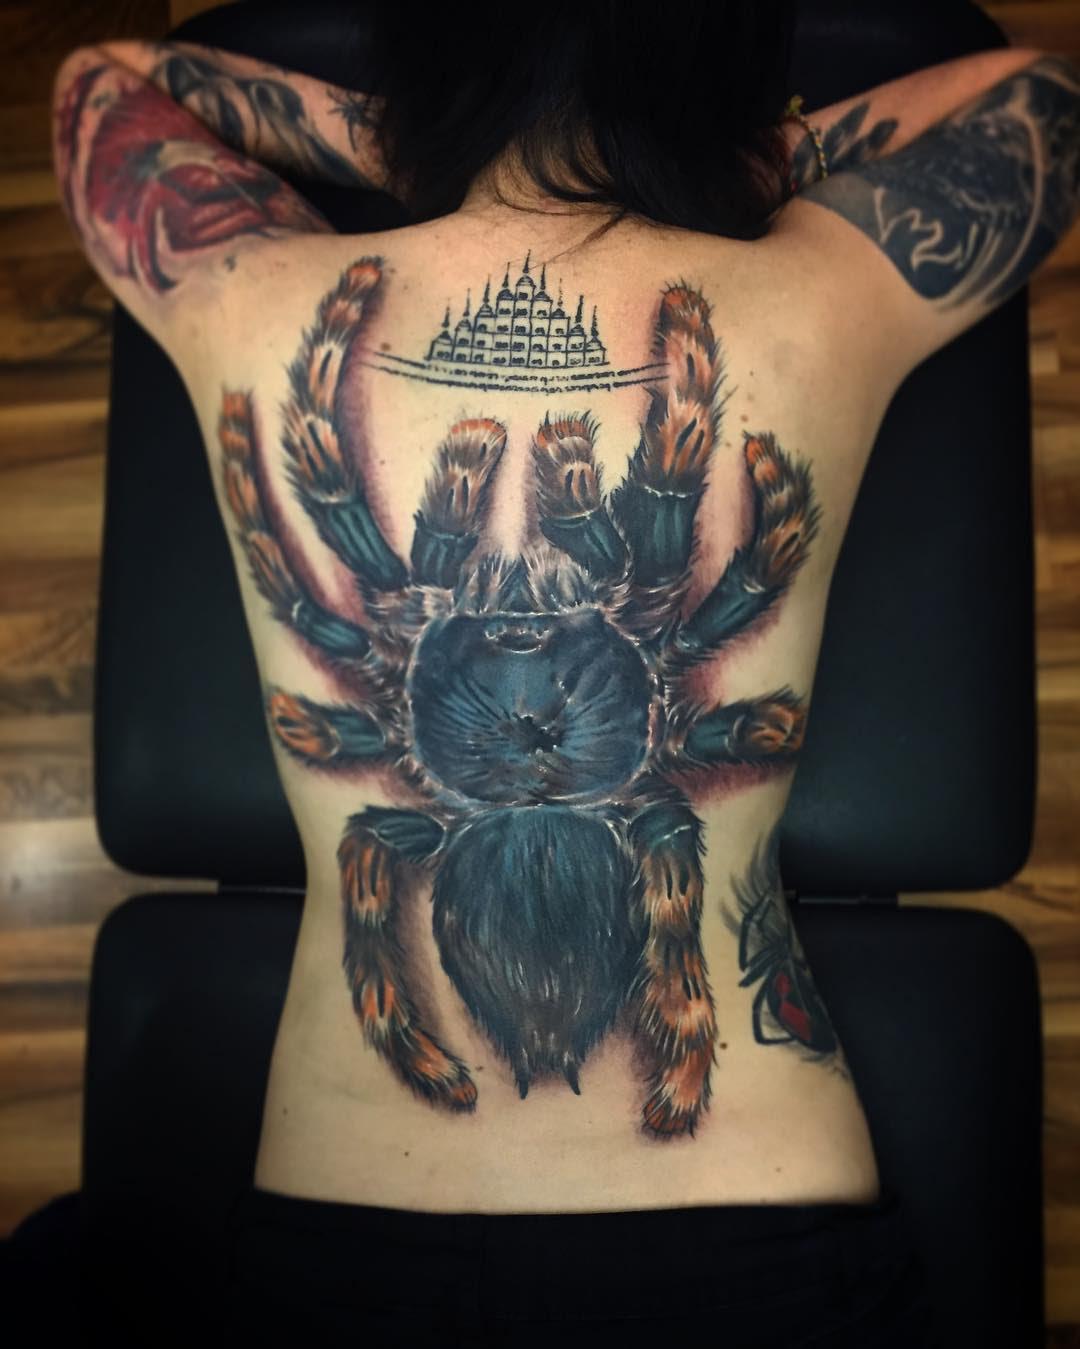 110+ Back Tattoo Designs For Men & Women -Designs